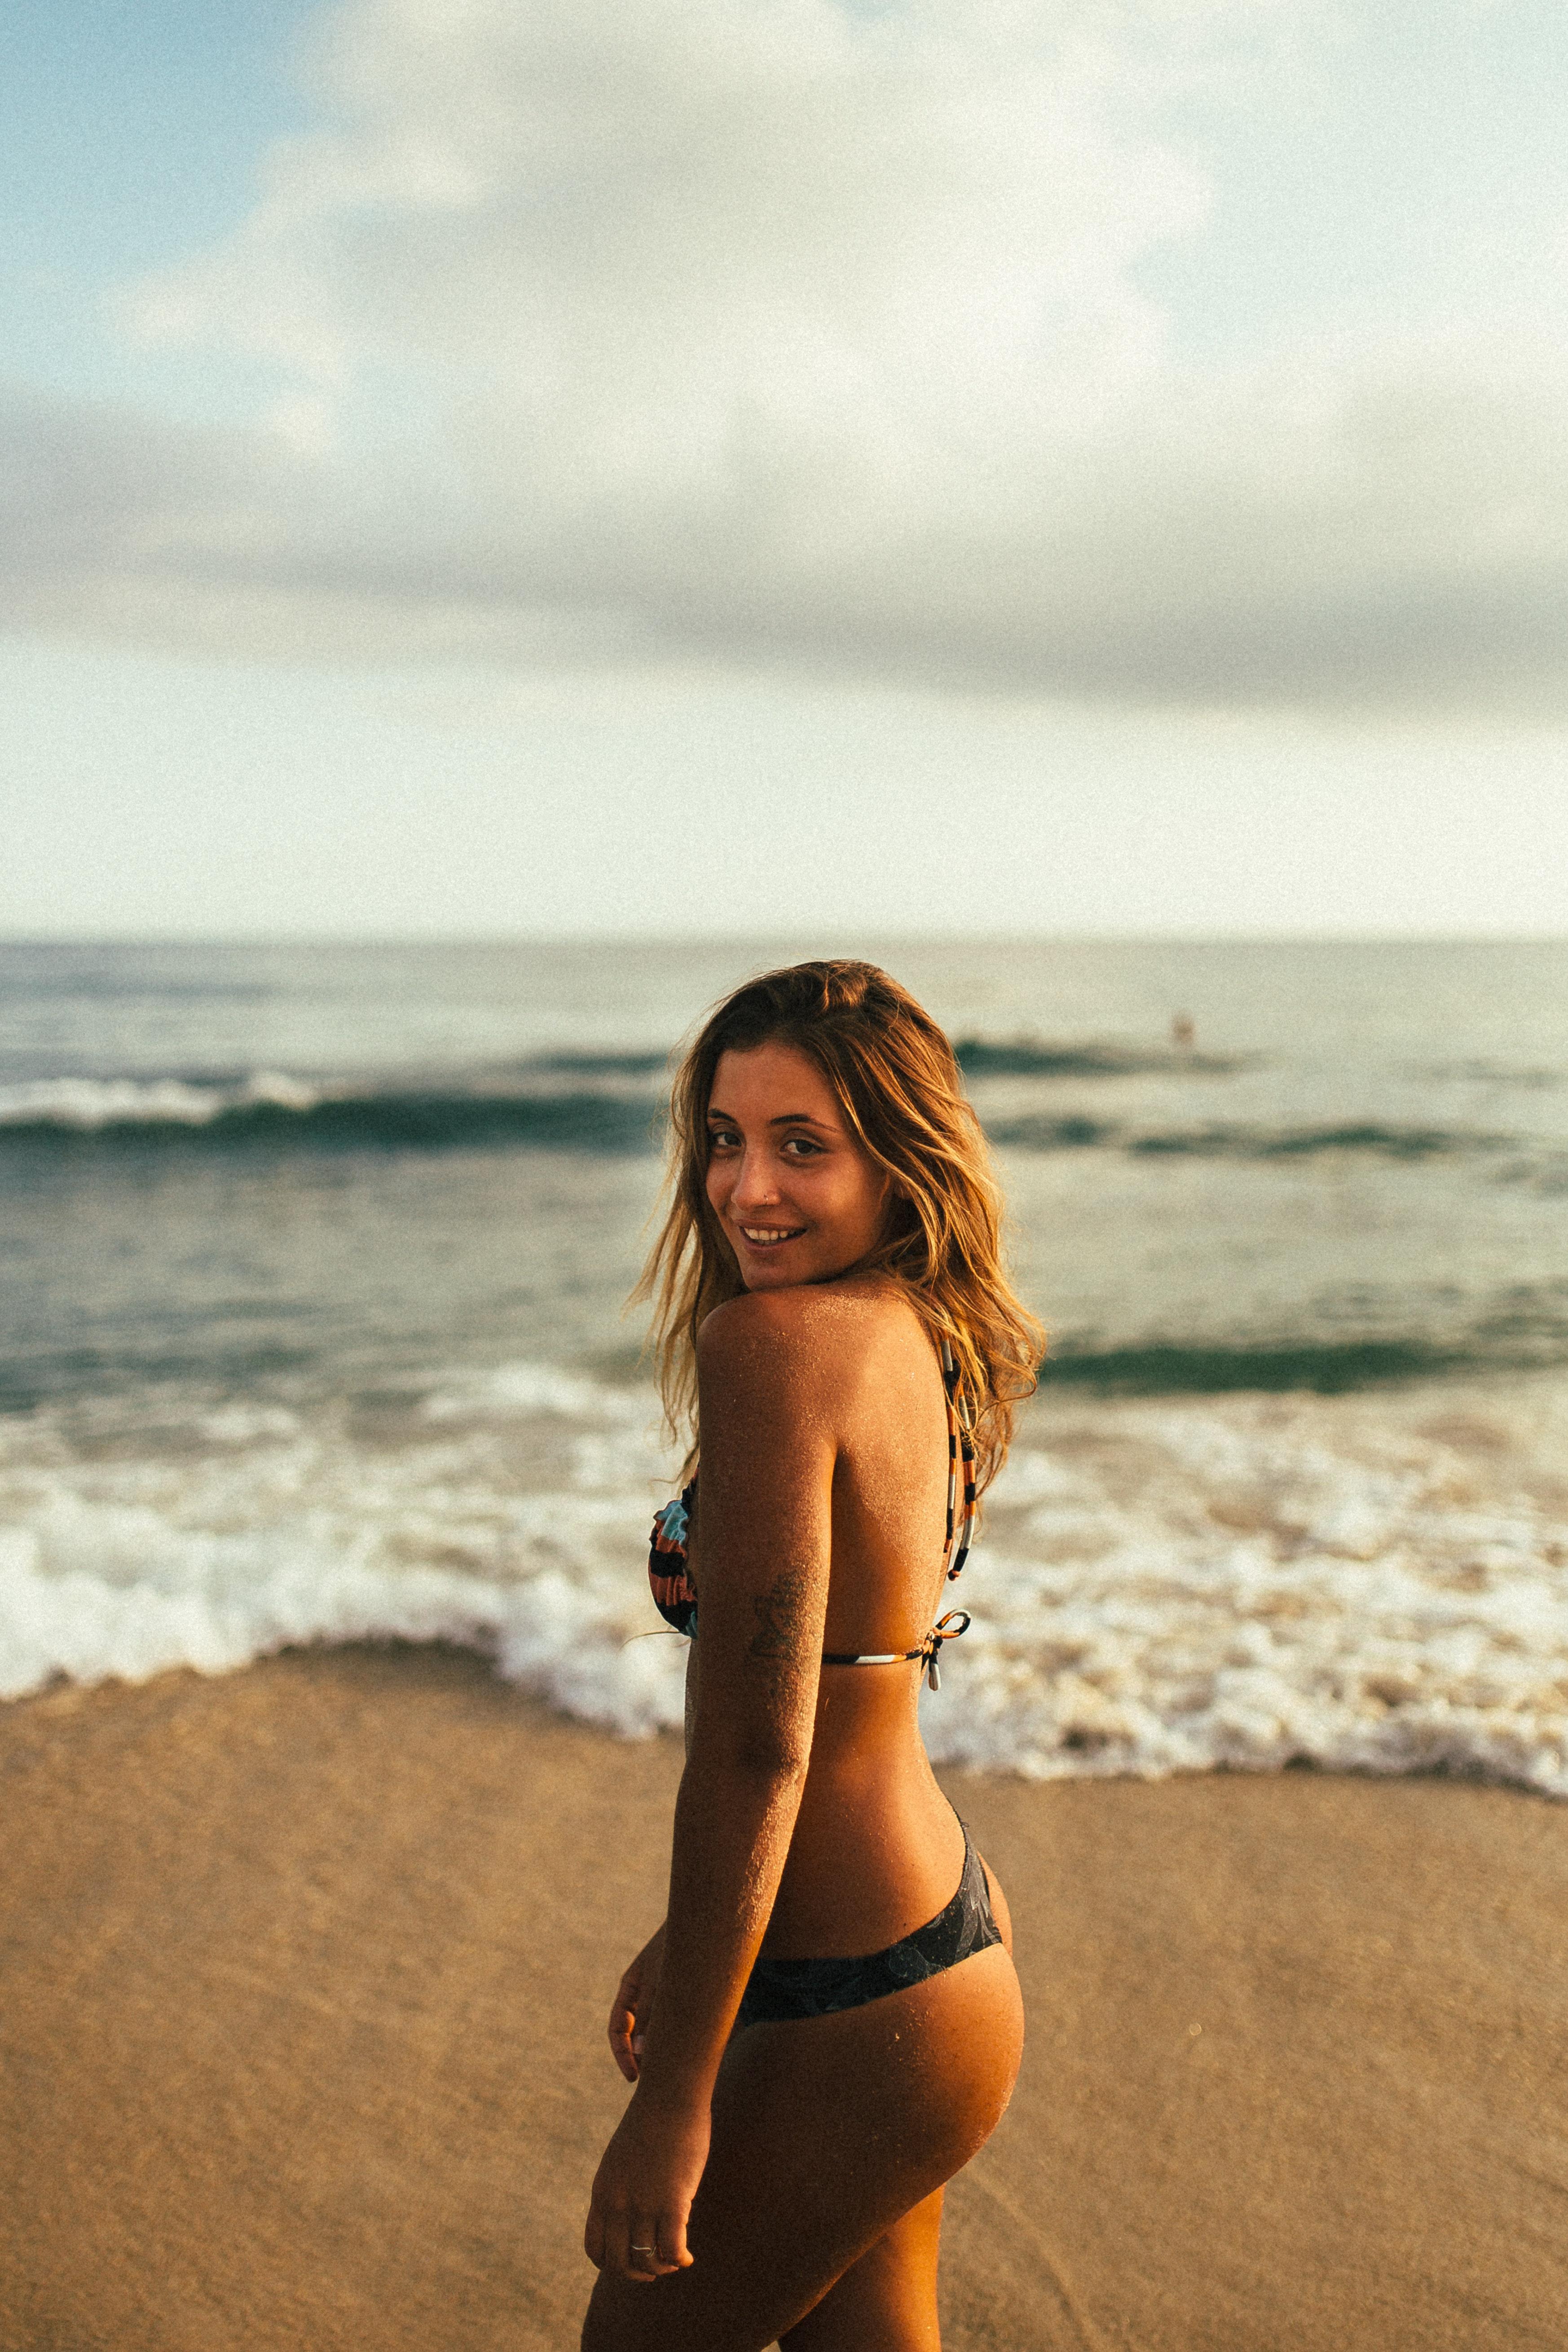 c171d2164ee Free Images : beach, beautiful, bikini, body, brazilian woman, daylight,  female, girl, leisure, model, ocean, outdoors, person, photoshoot,  portrait, pose, ...